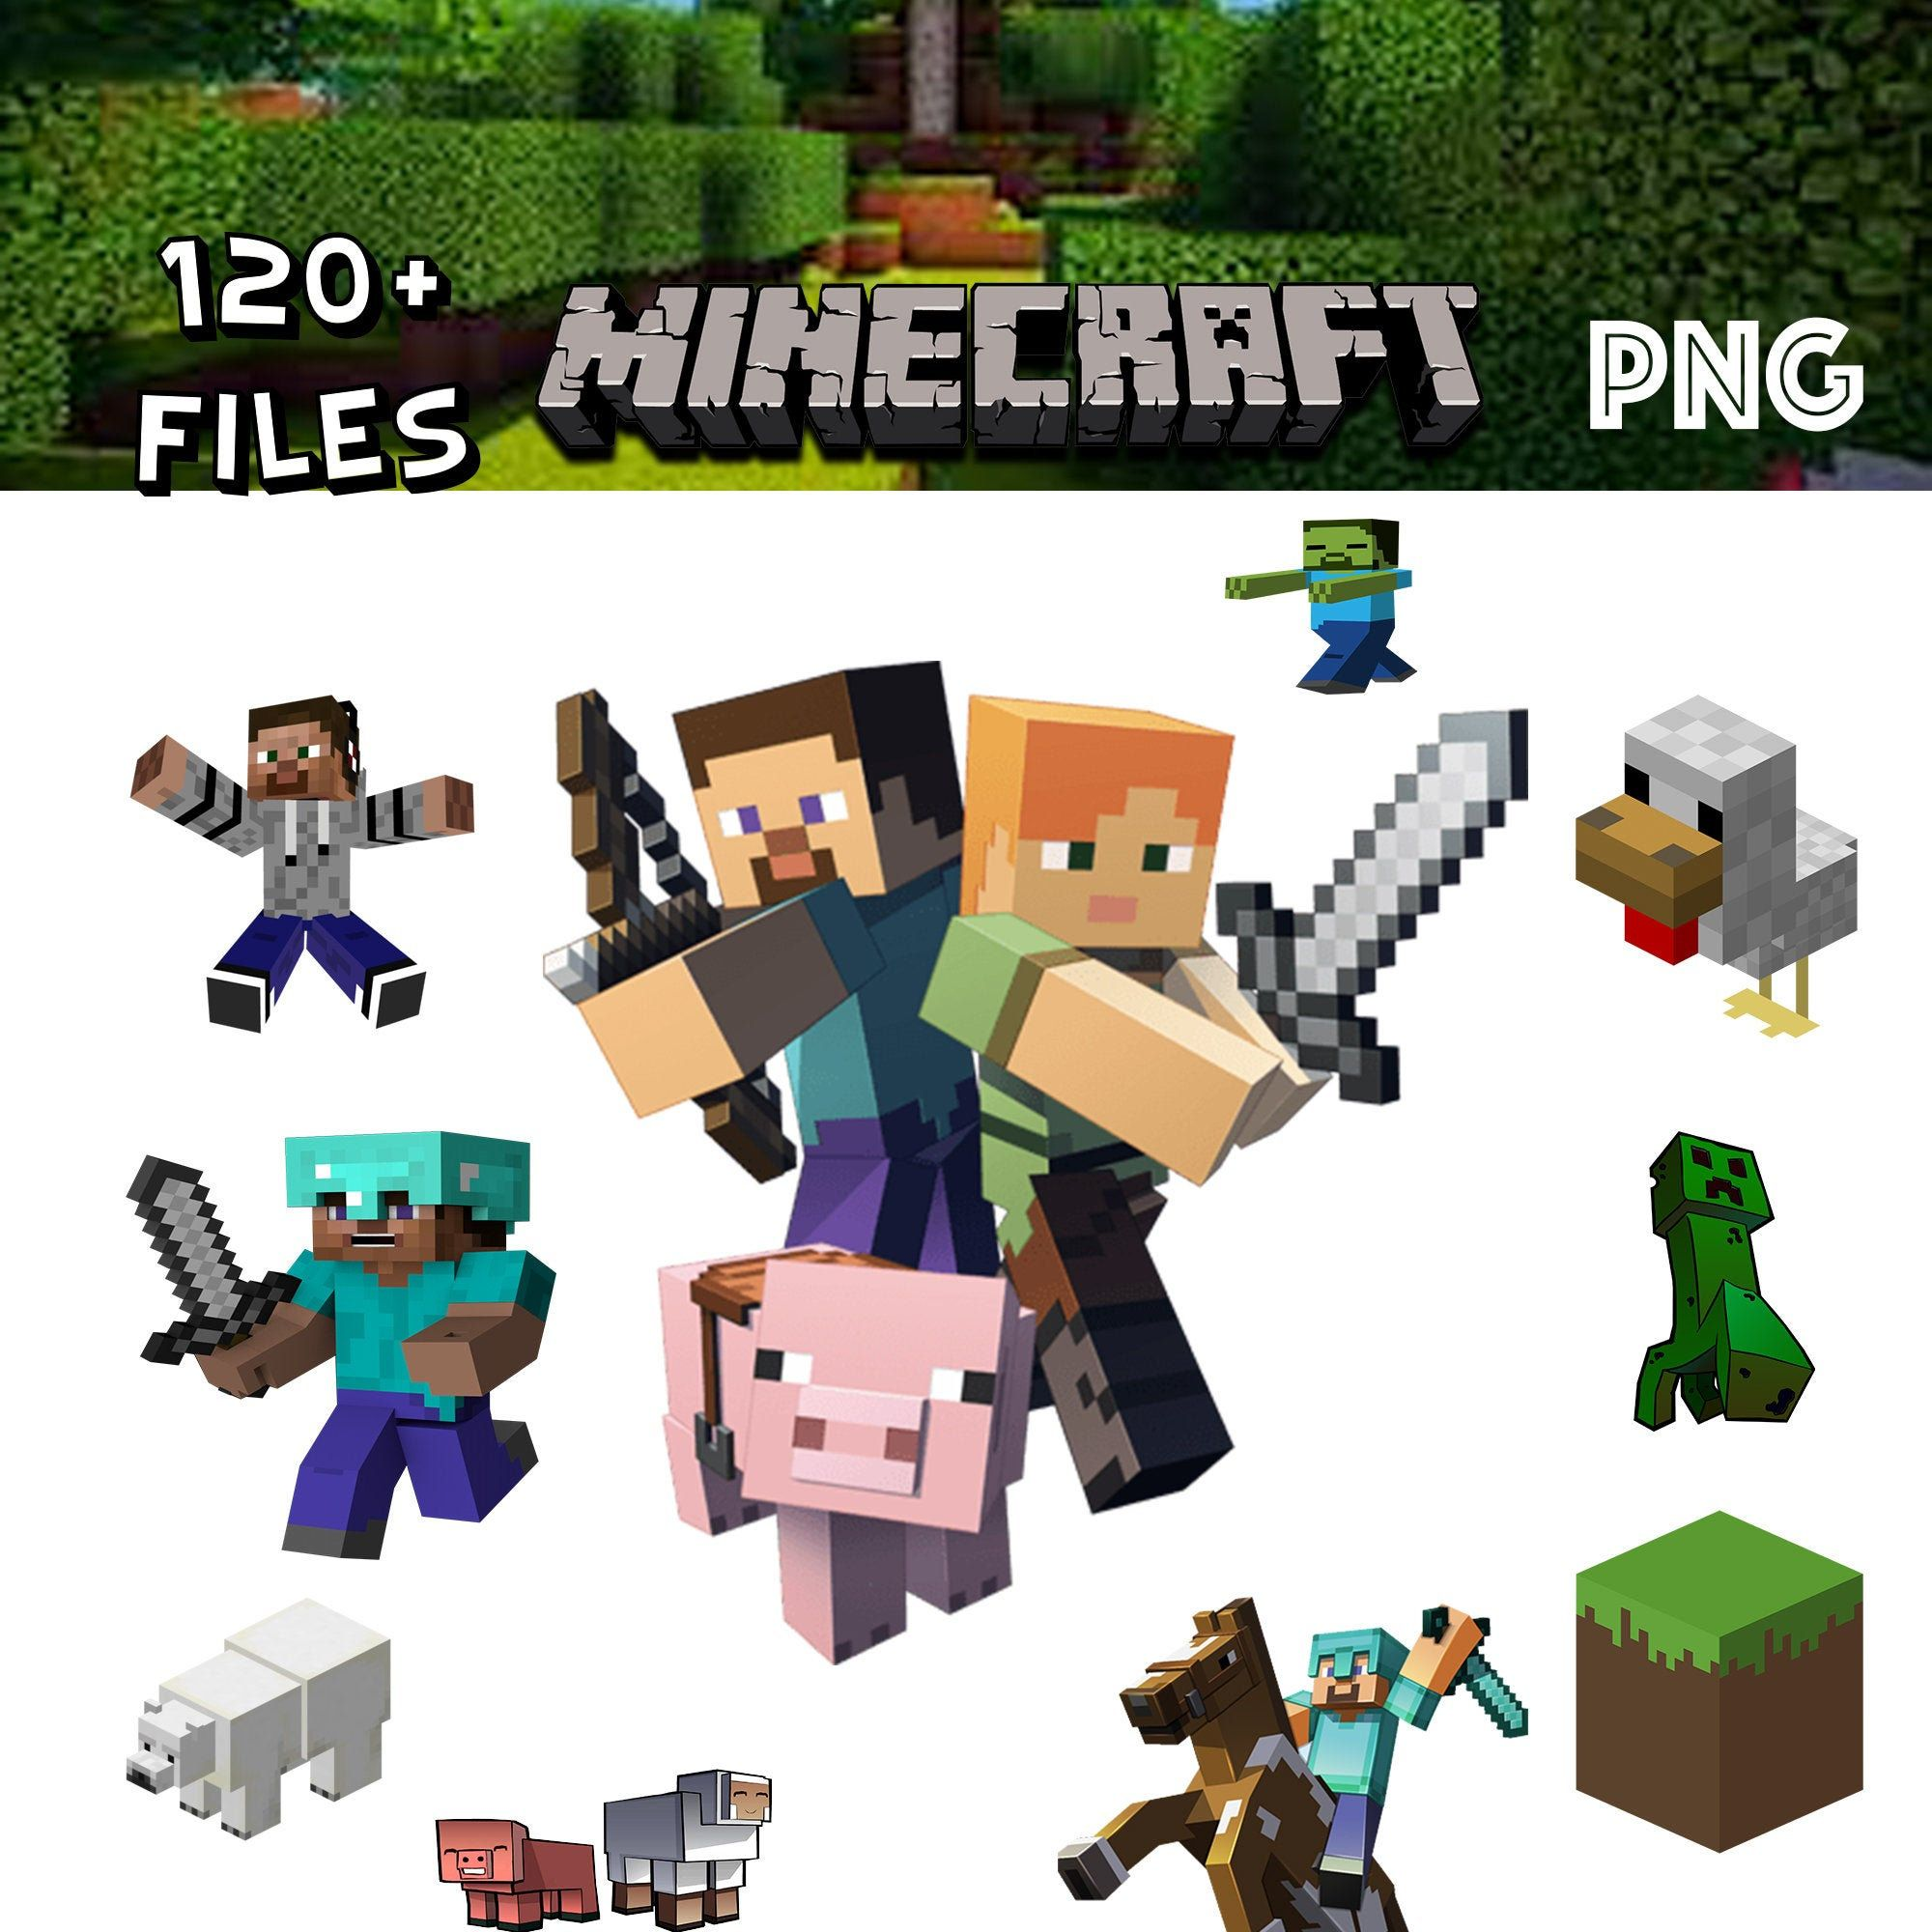 Minecraft Inspired Transparent Background Set Png Clipart Digital Download Creeper Block Herobrine Zombie Steve Alex Wither By Clip Art Digital Inspiration